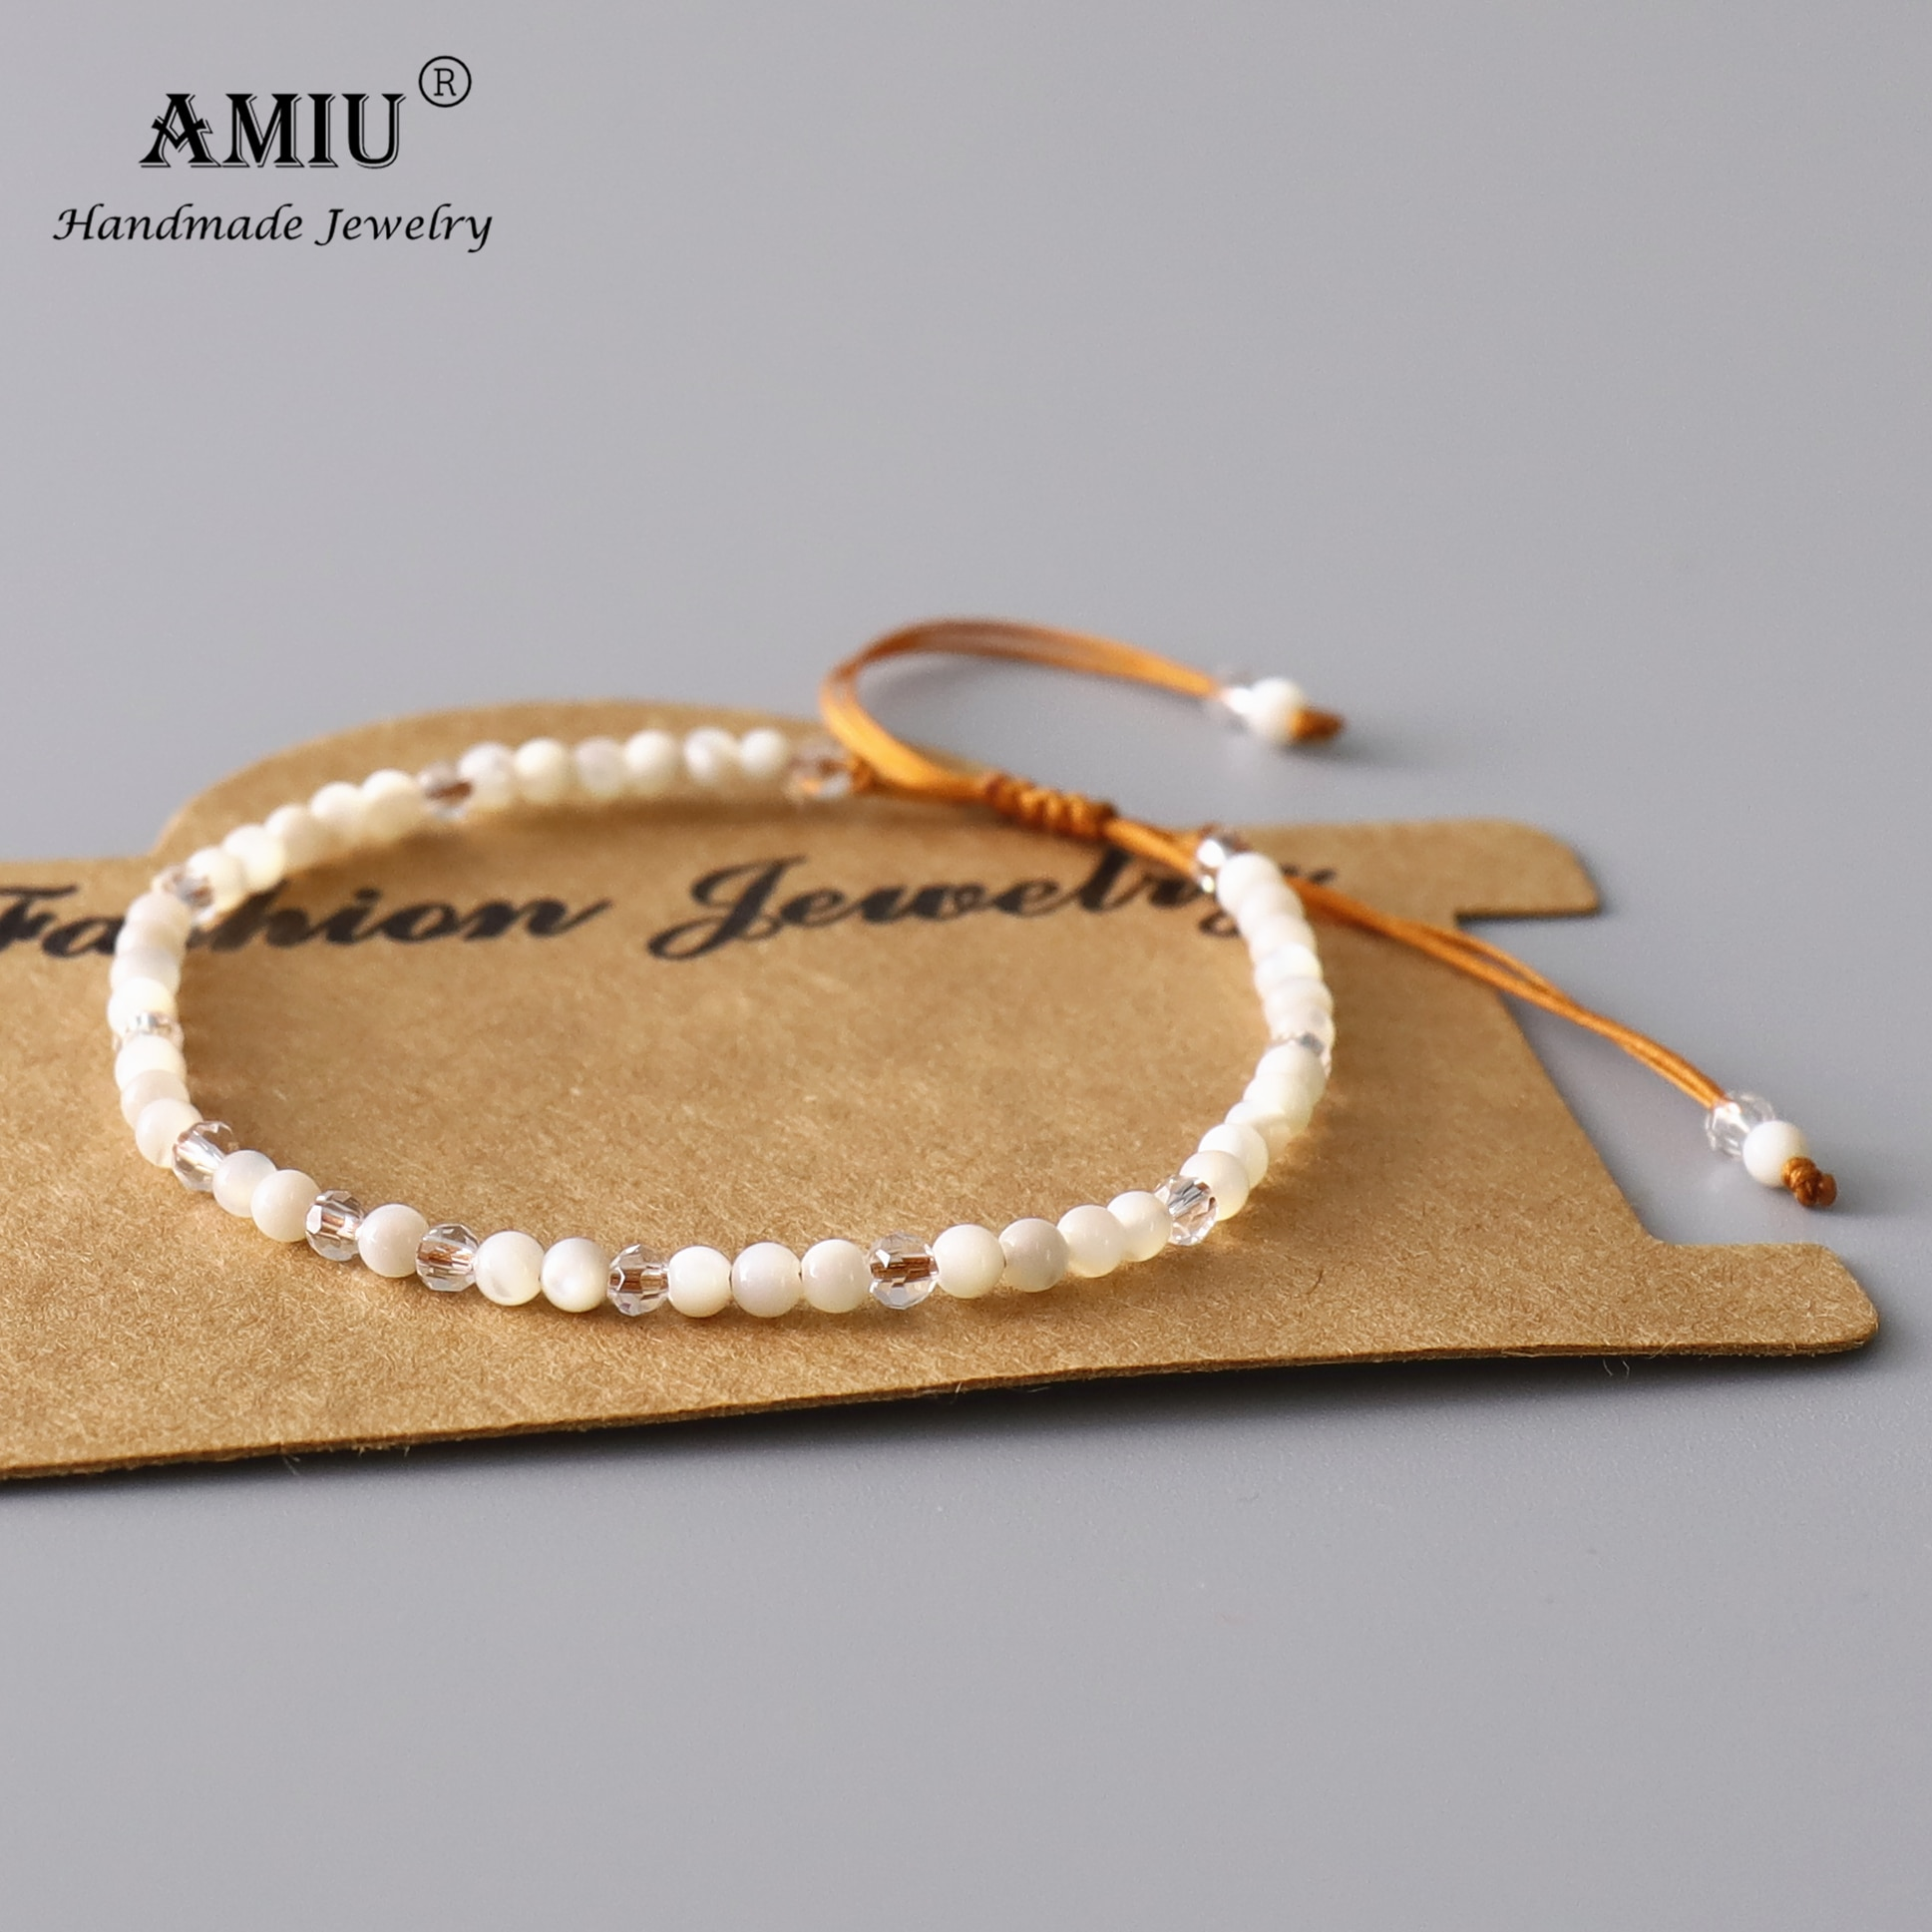 AMIU-Bracelet-en-perles-blanches-m-re-de-perles-bijou-ajustable-en-cristal-naturel-boh-me